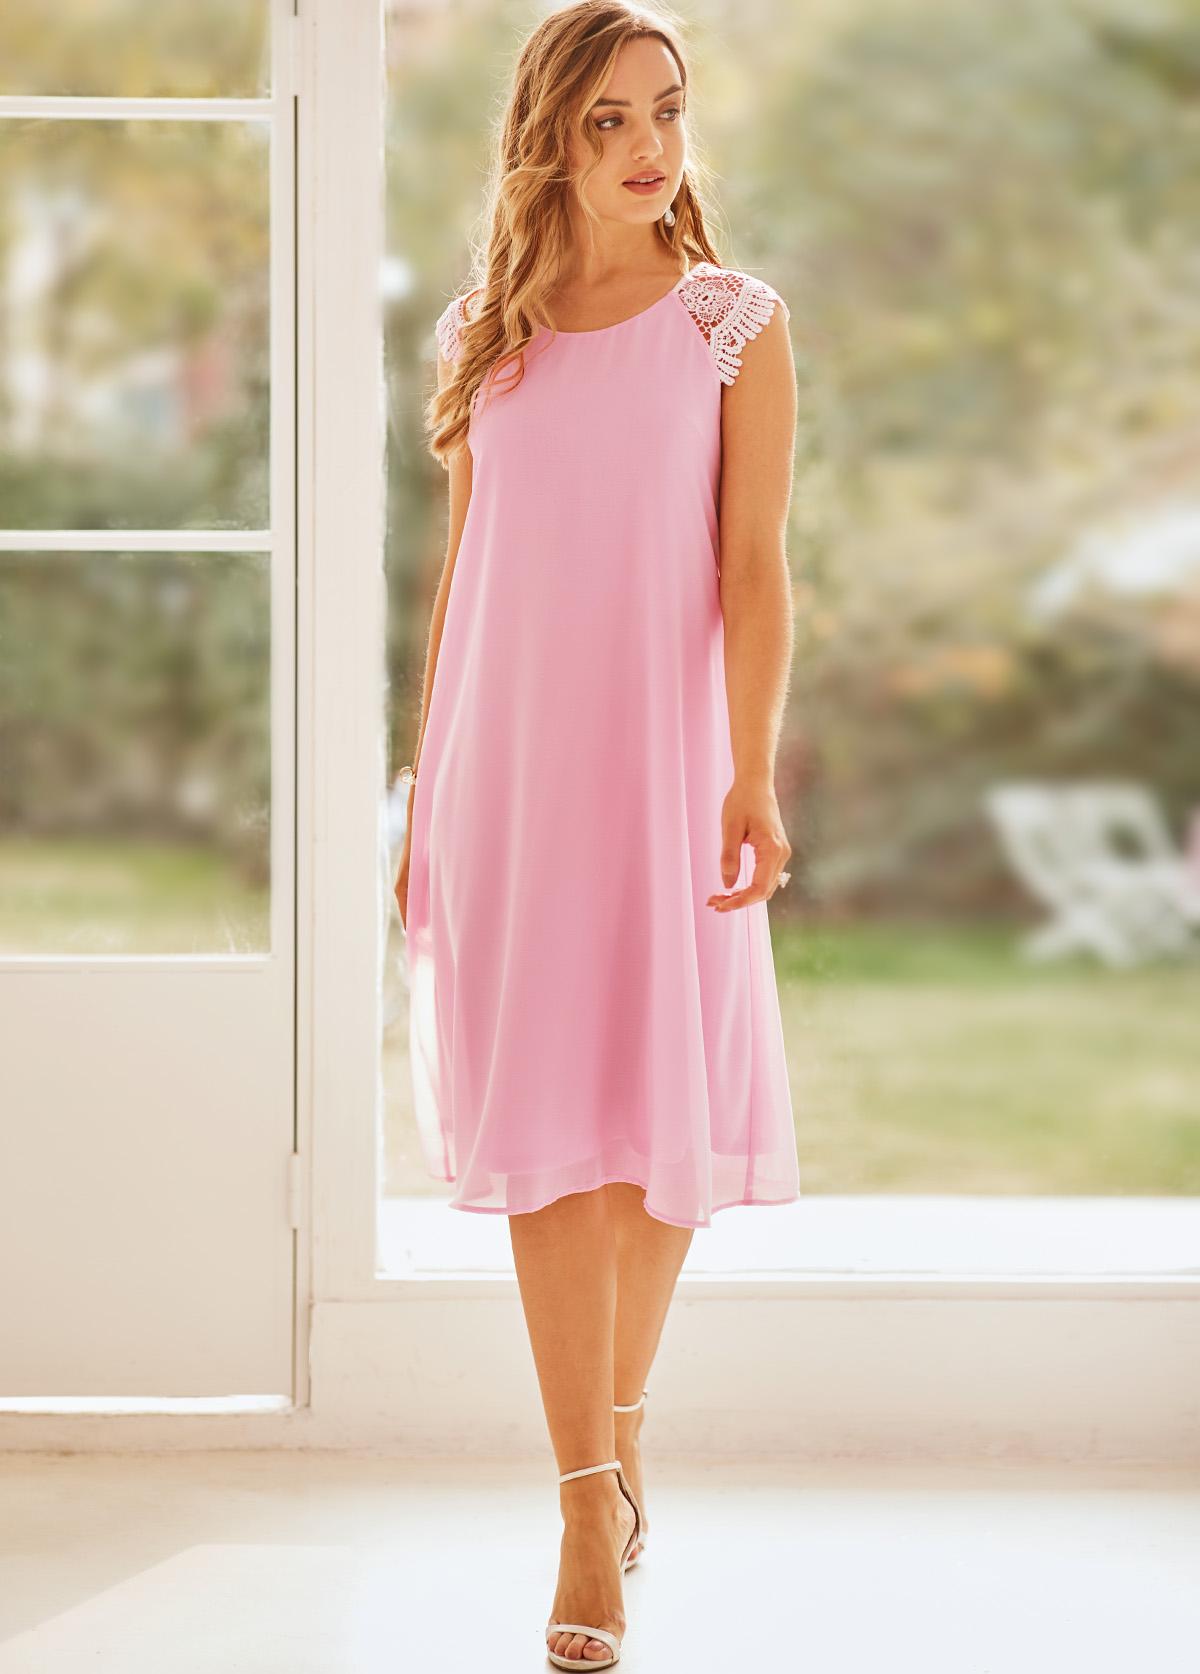 Lace Panel Pink Sleeveless Round Neck Dress